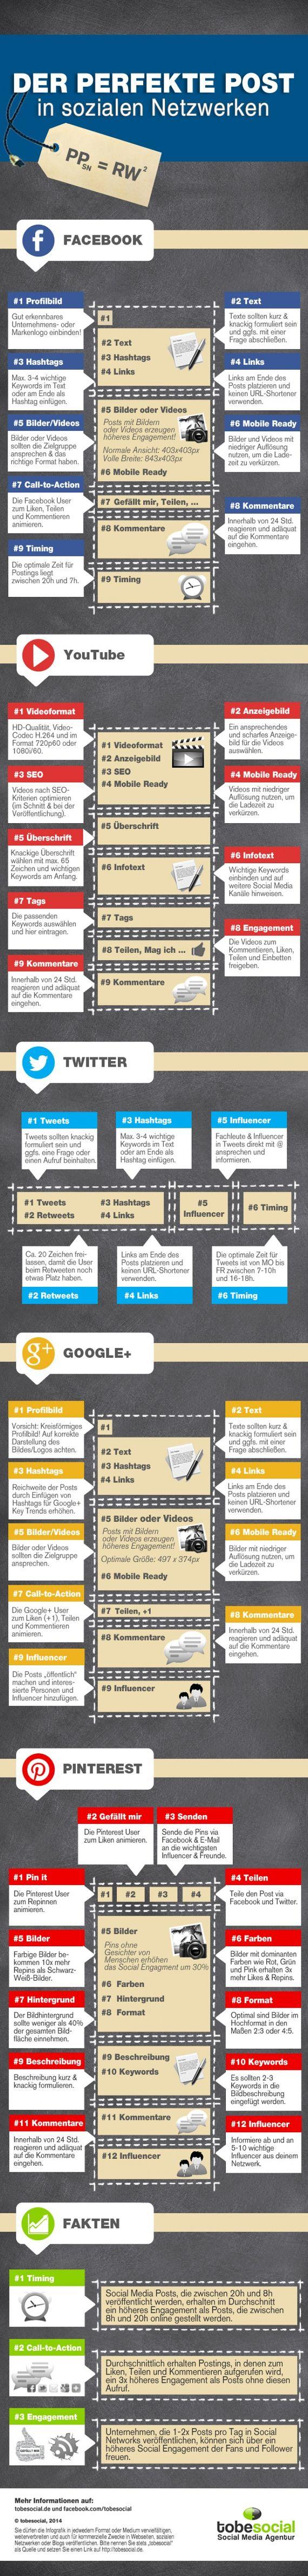 Top- Infograhik : Der perfekte Post in #socialmedia via @Social Media Agentur tobesocial #facebook #youtube #pinterest